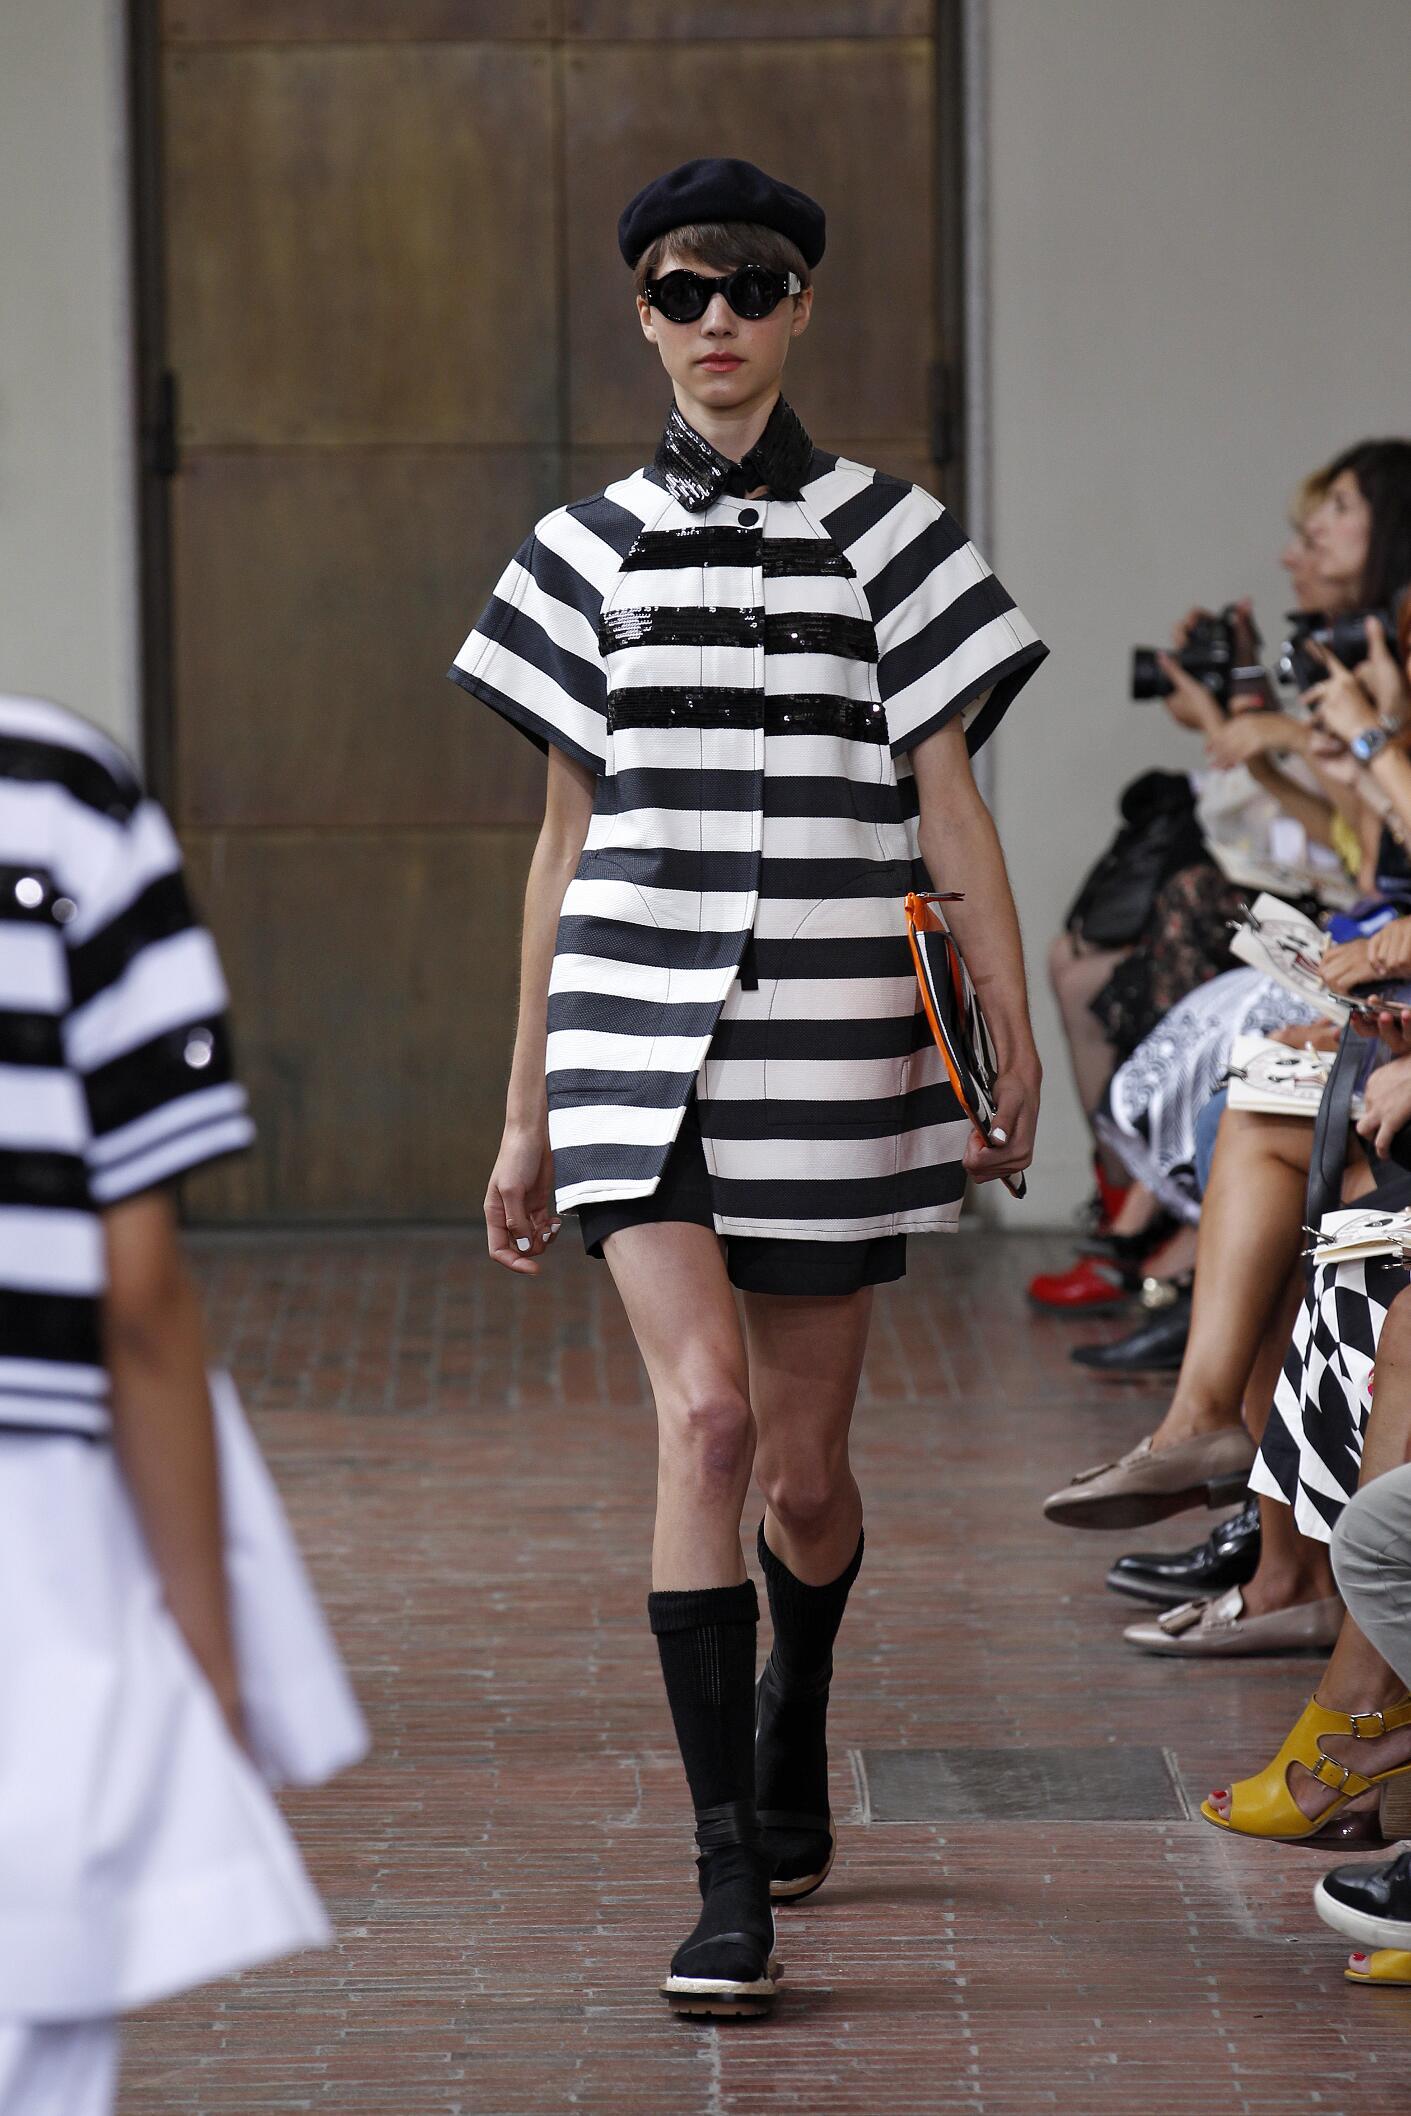 Summer 2015 Fashion Show I'm Isola Marras